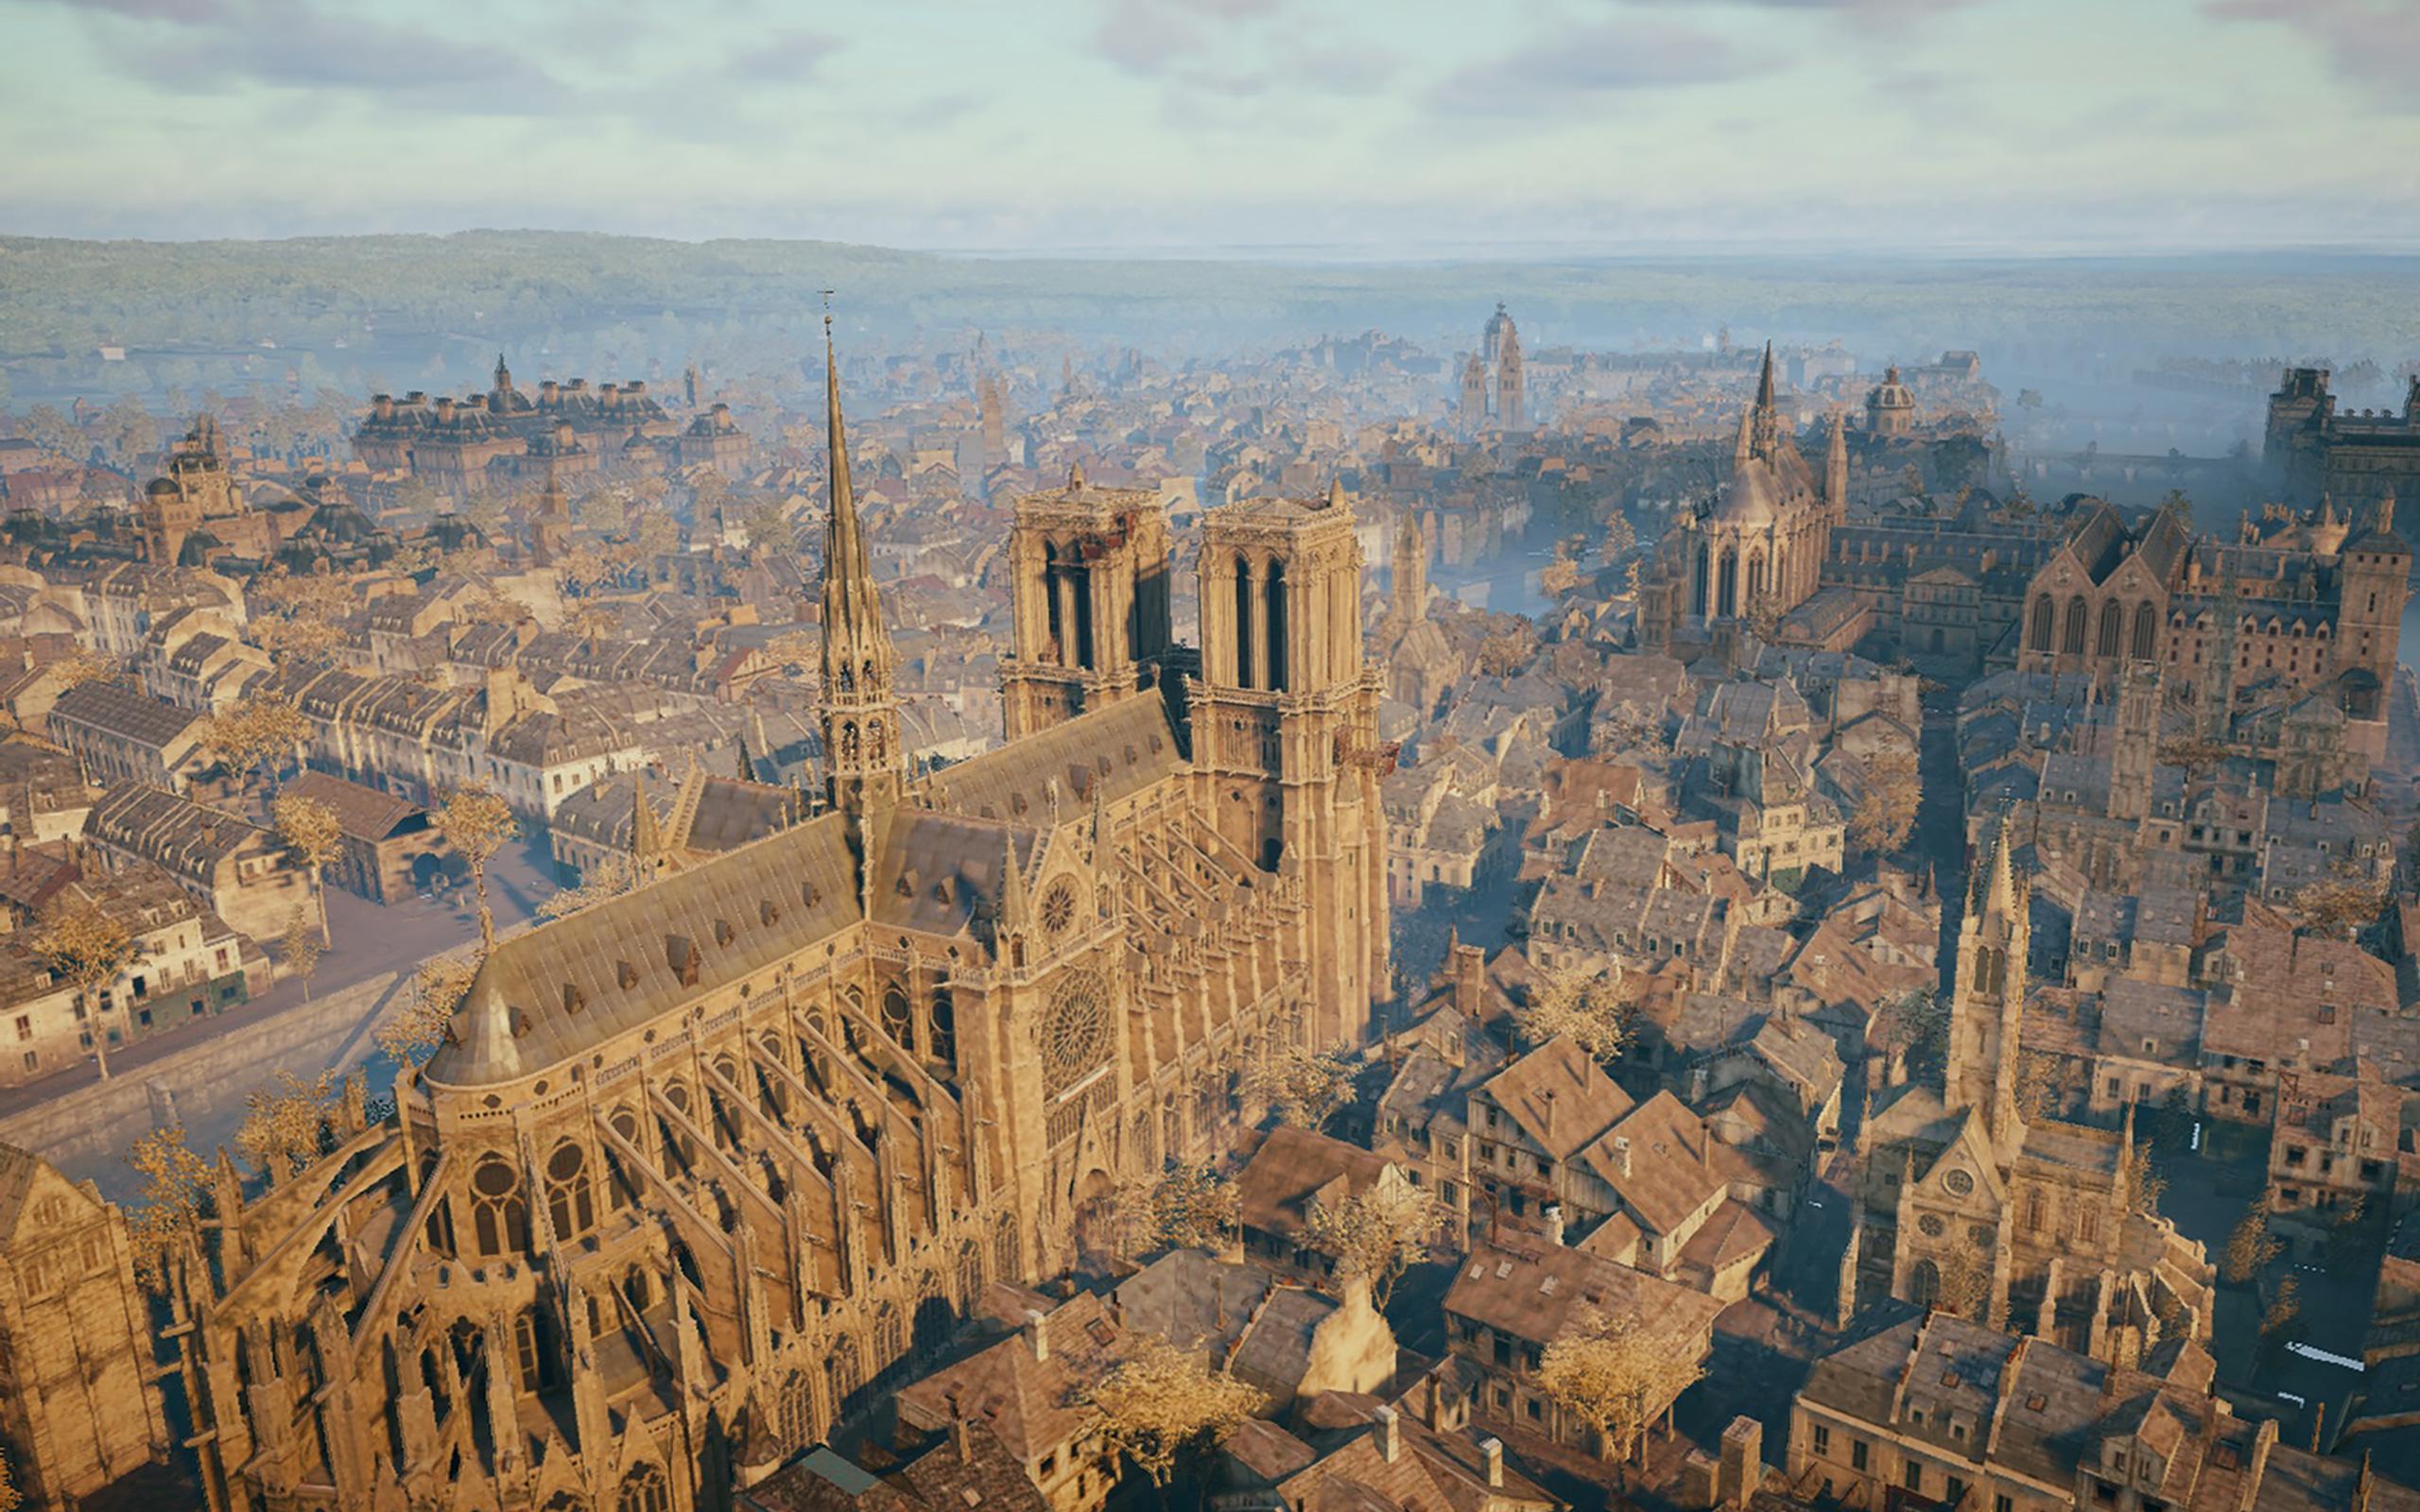 Assassin's Creed Unity: Paris